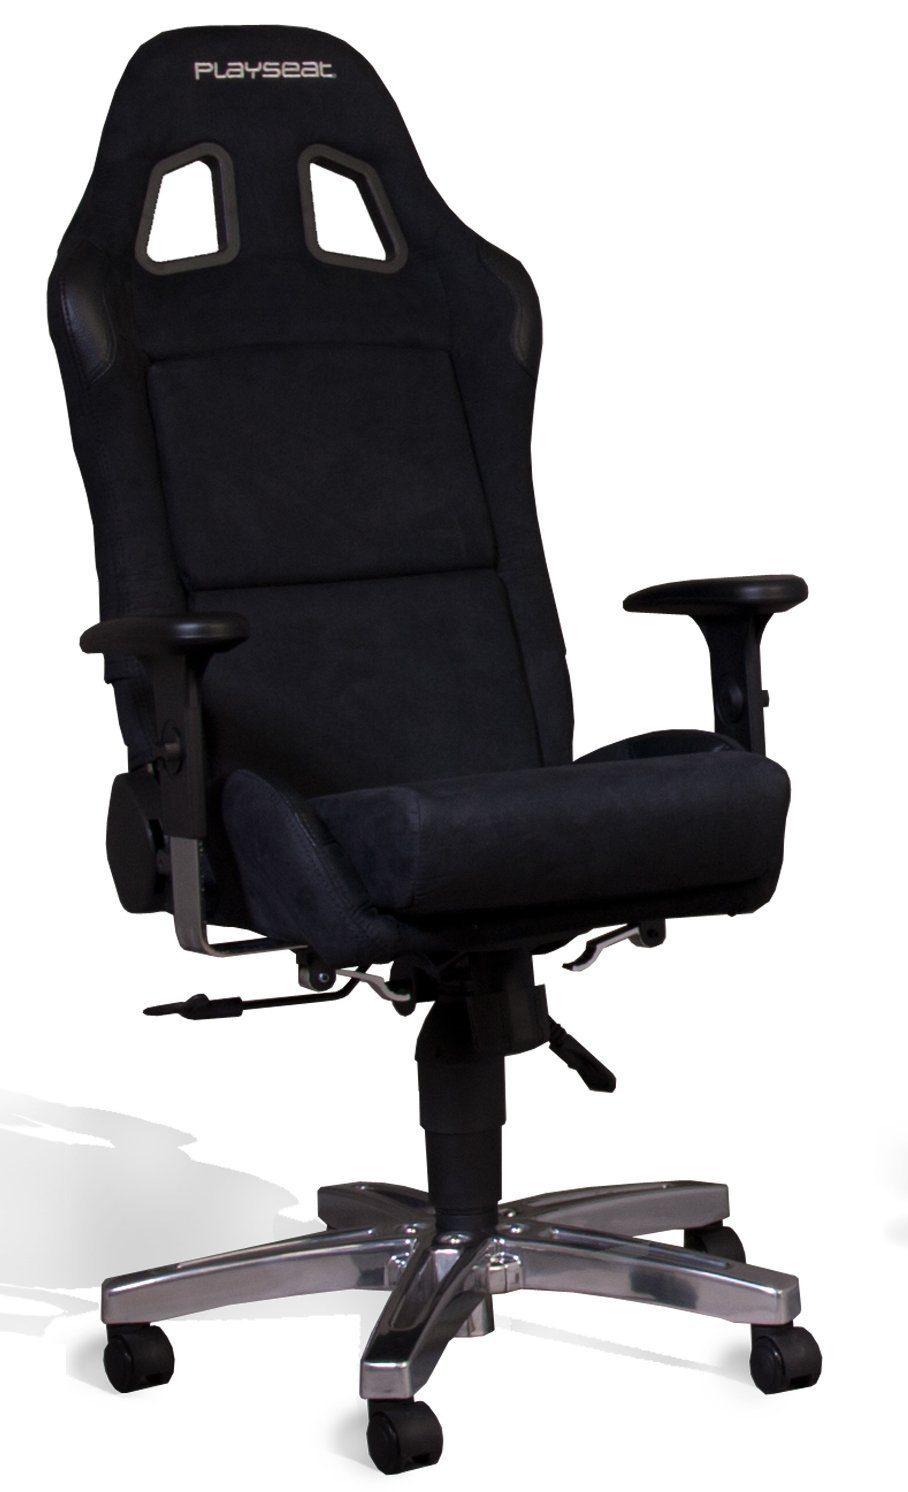 Playseats Playseat Office Seat Alcantara »PS3 PS4 Wii WiiU X360 XBox One PC«